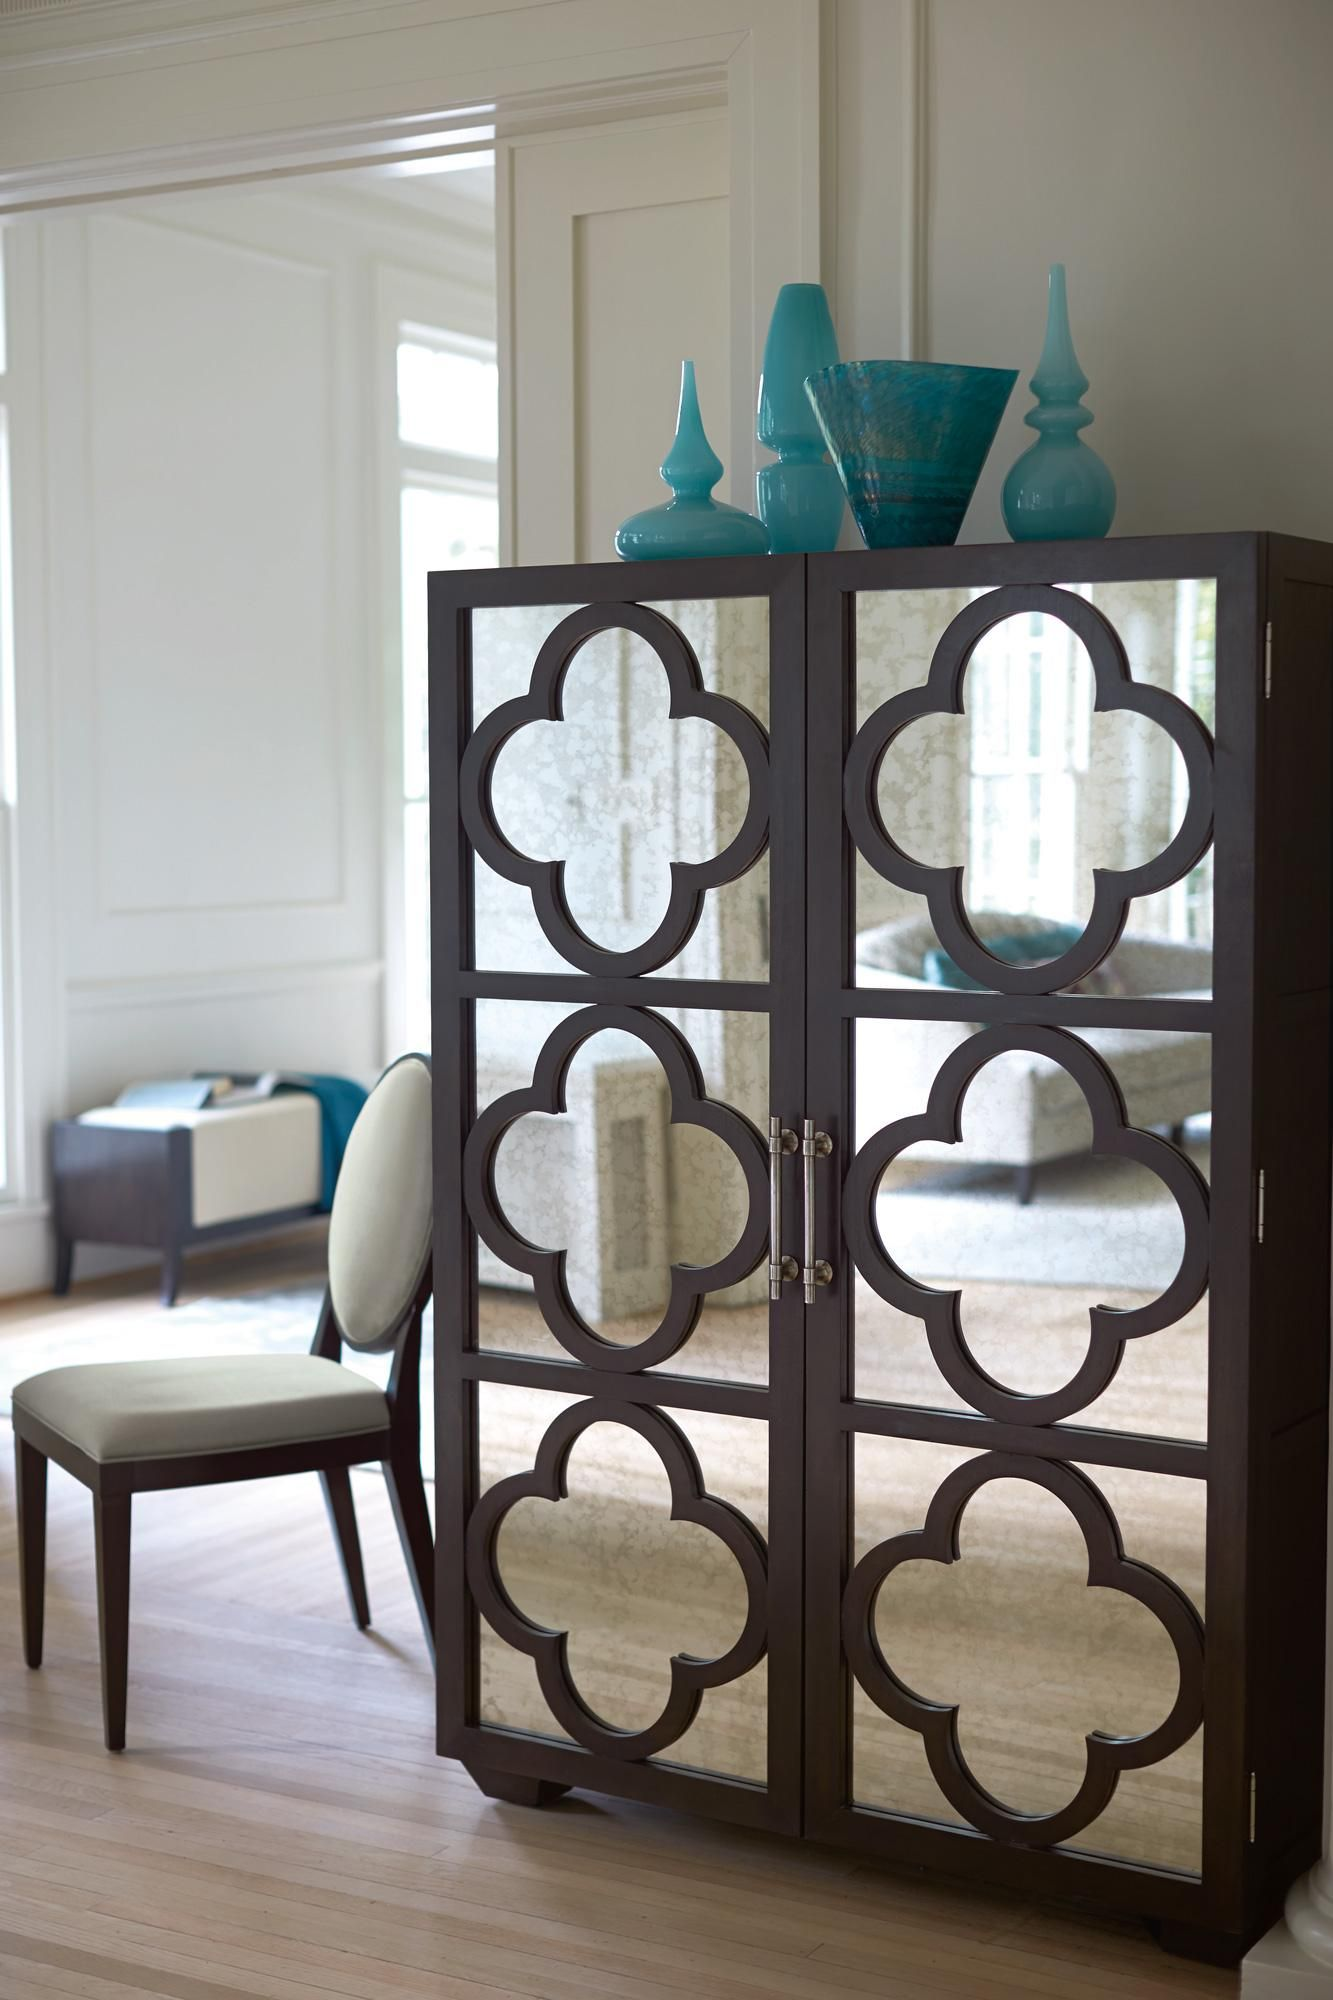 Haven Two Door Cabinet With Quatrefoil Overlay Design By Bernhardt At Story  U0026 Lee Furniture